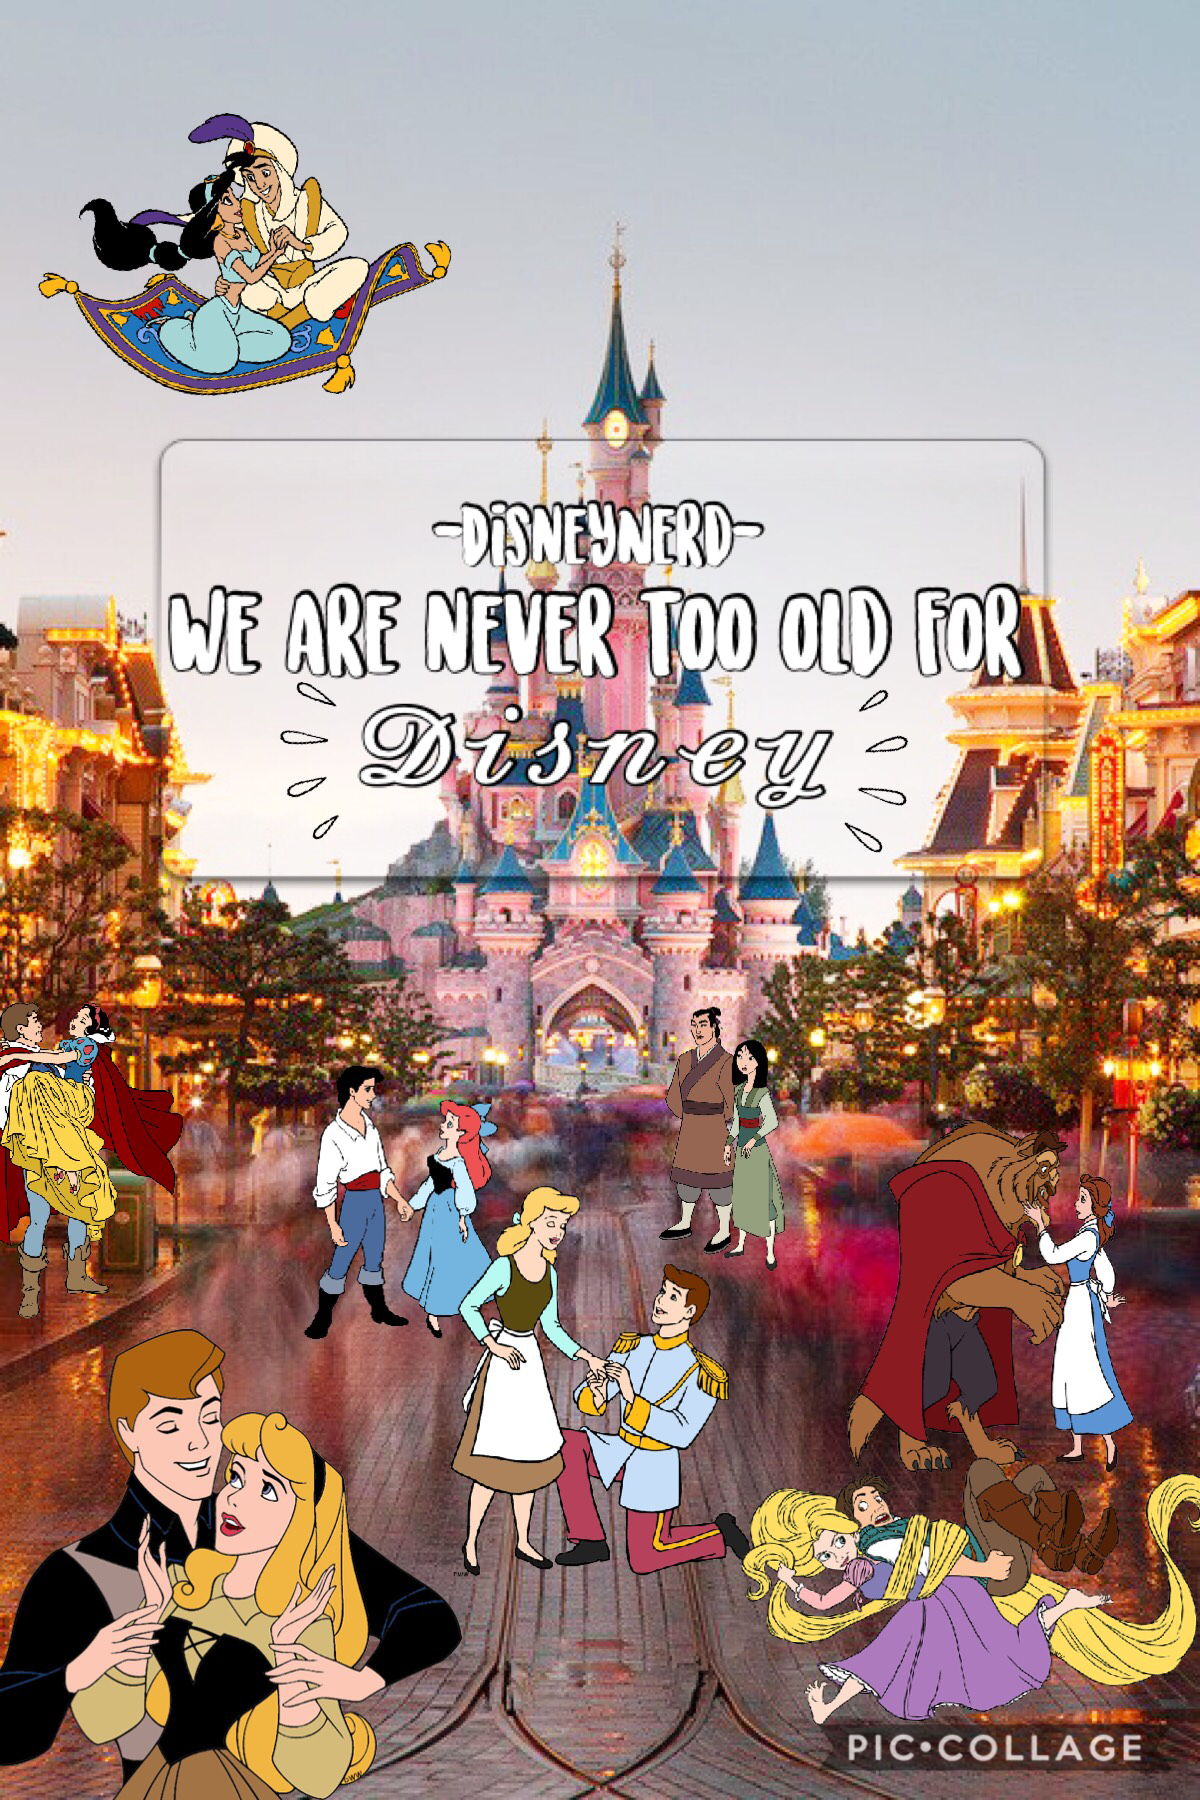 Collage by -DisneyNerd-